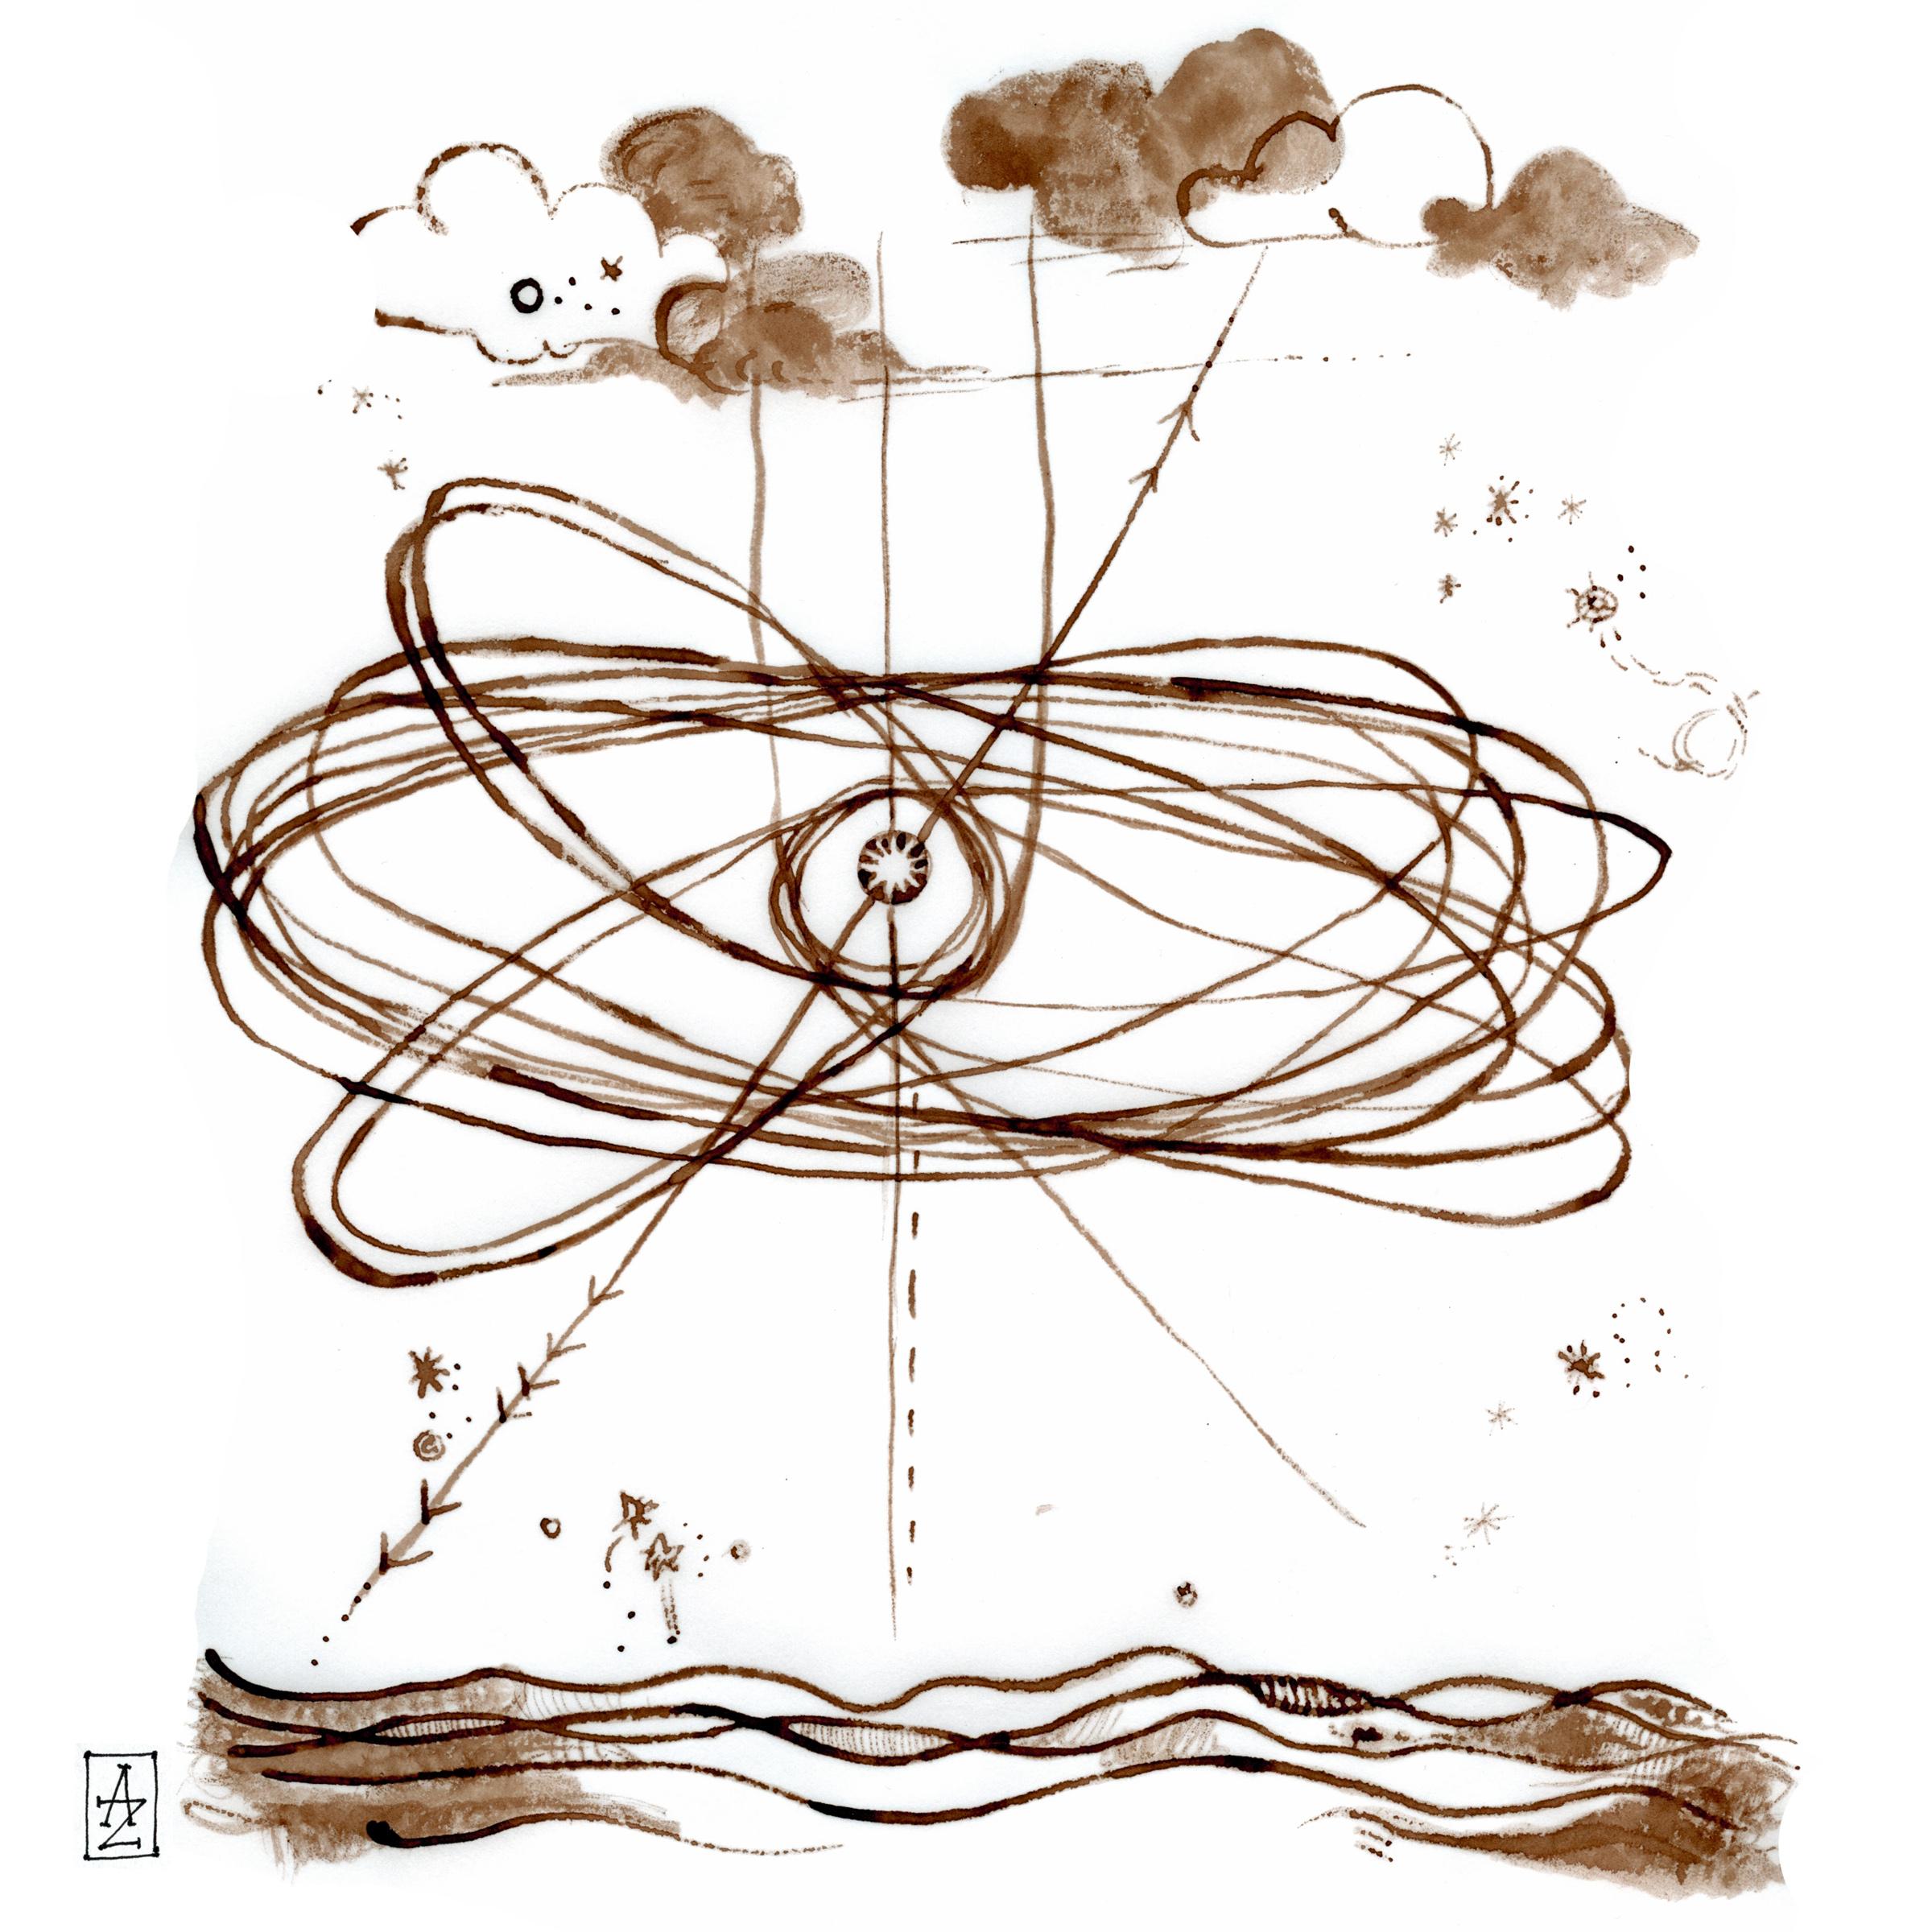 orbits, walnut ink, 8.2013